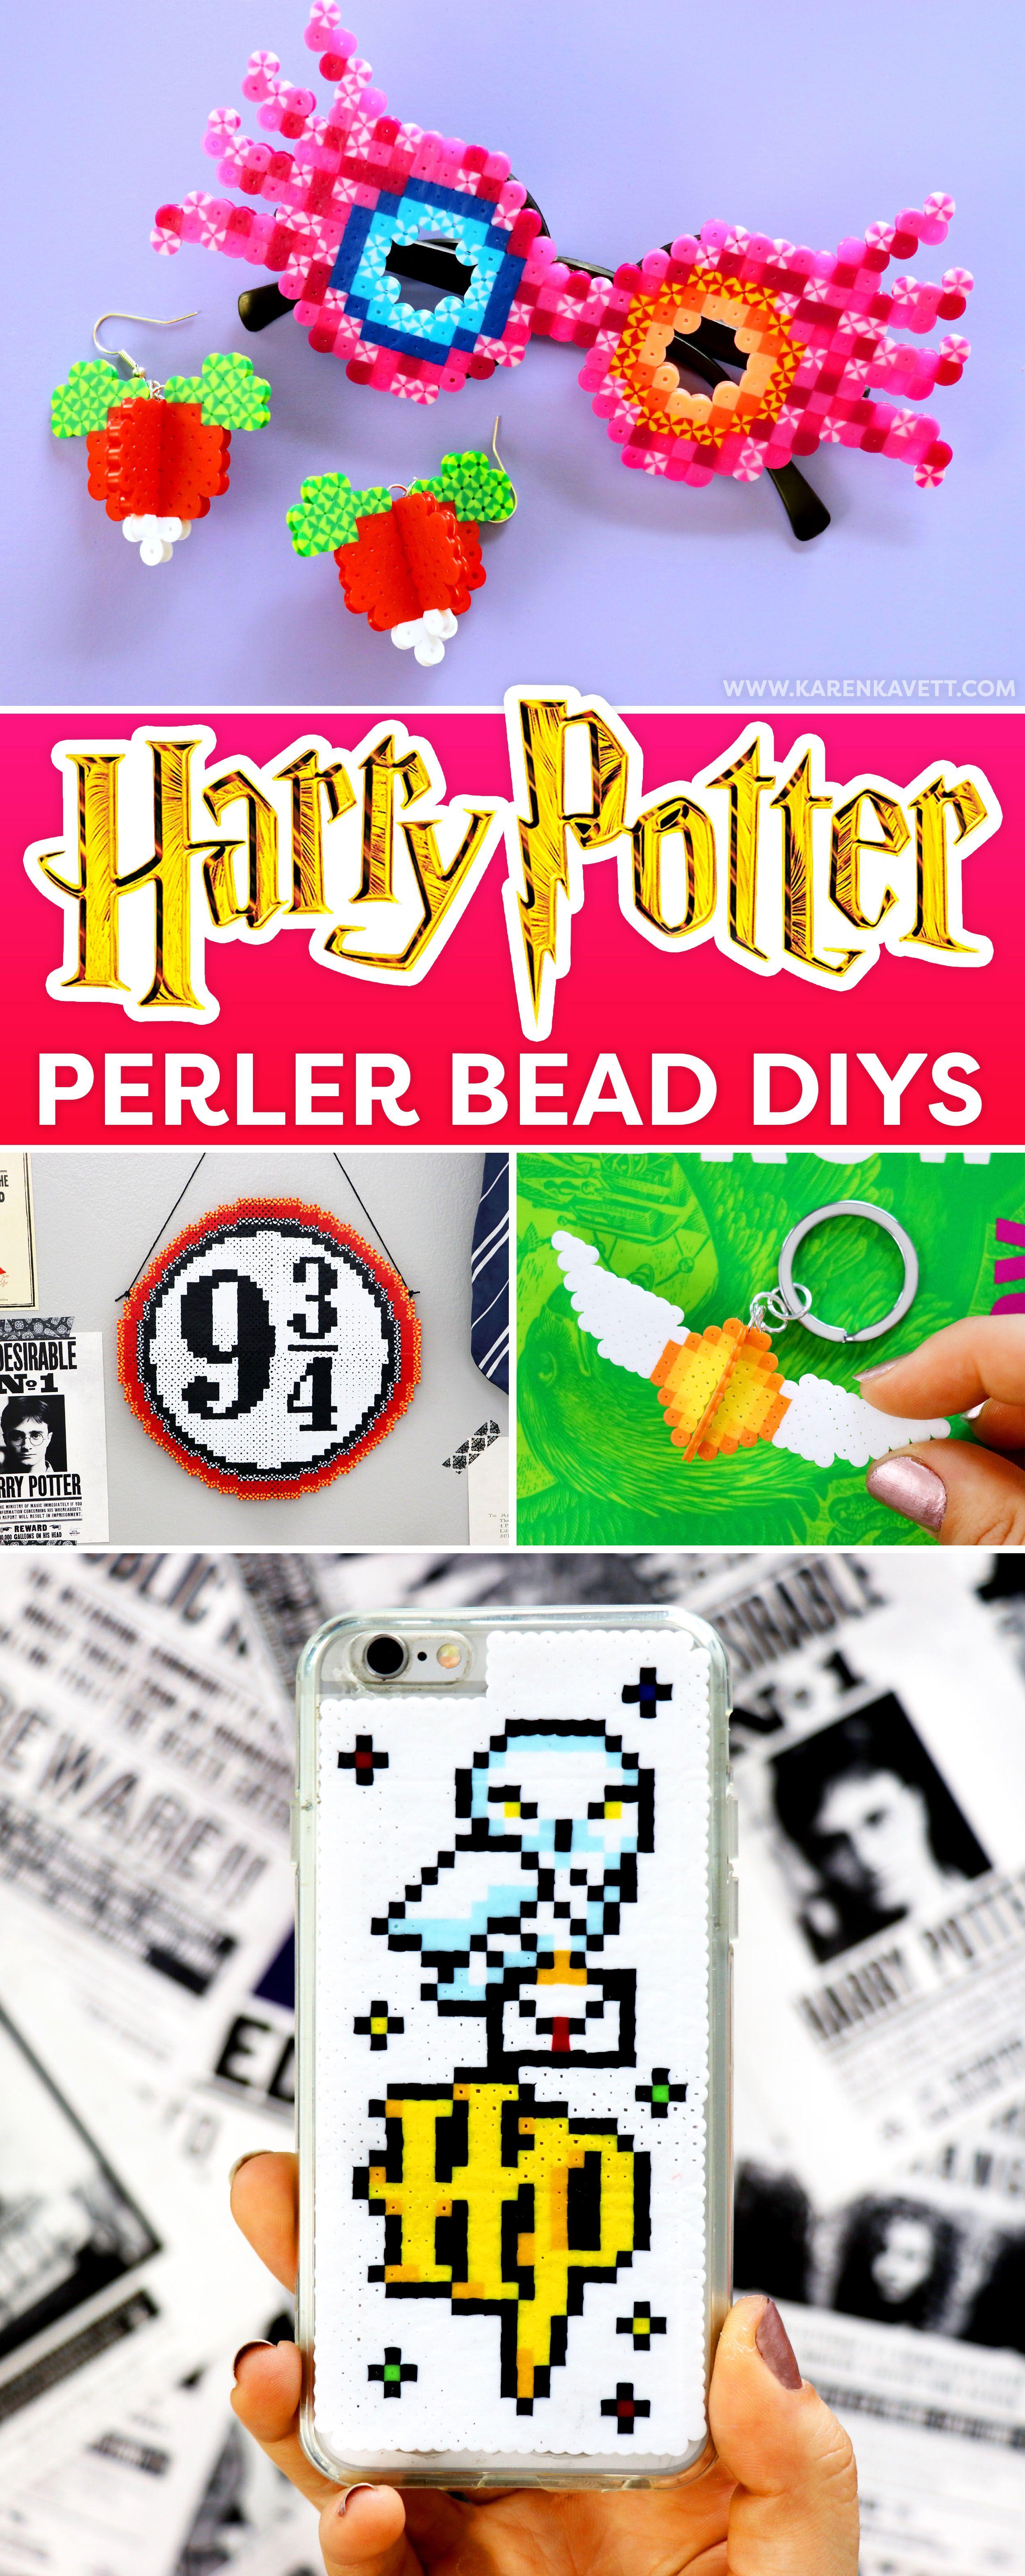 Diy Harry Potter Perler Bead Crafts